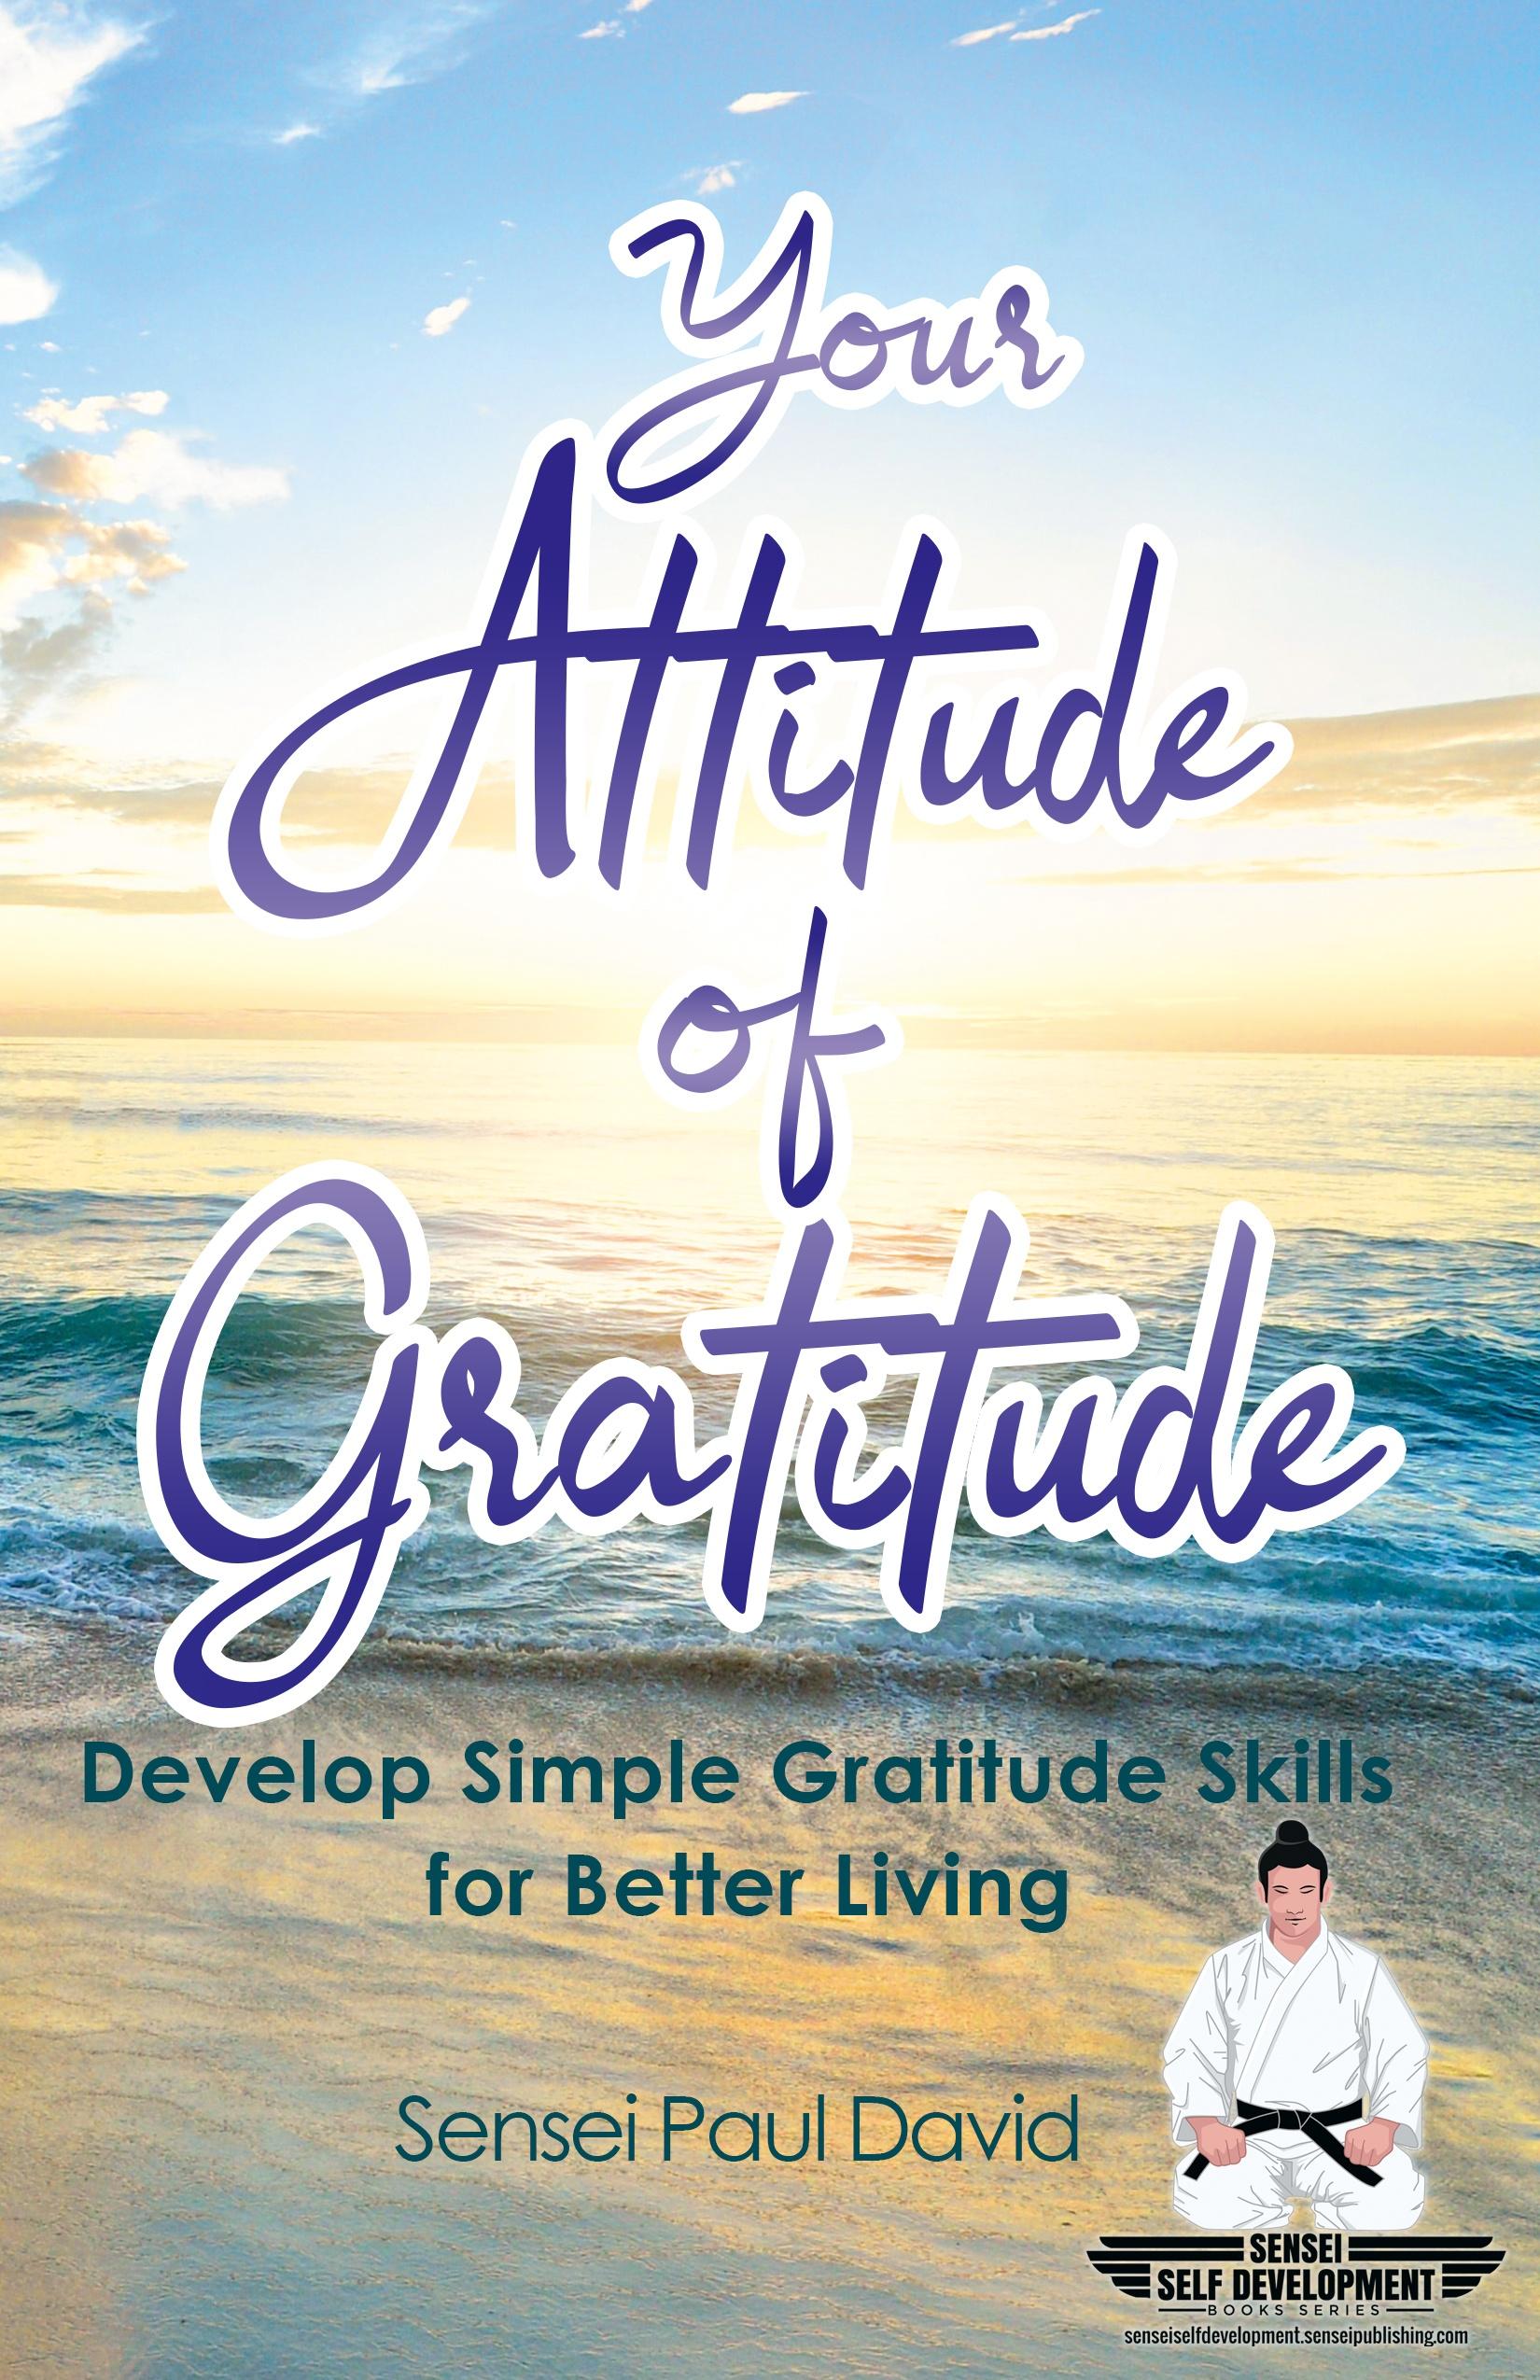 Your-Attitude-of-Gratitude_eBook_Kindle.jpg